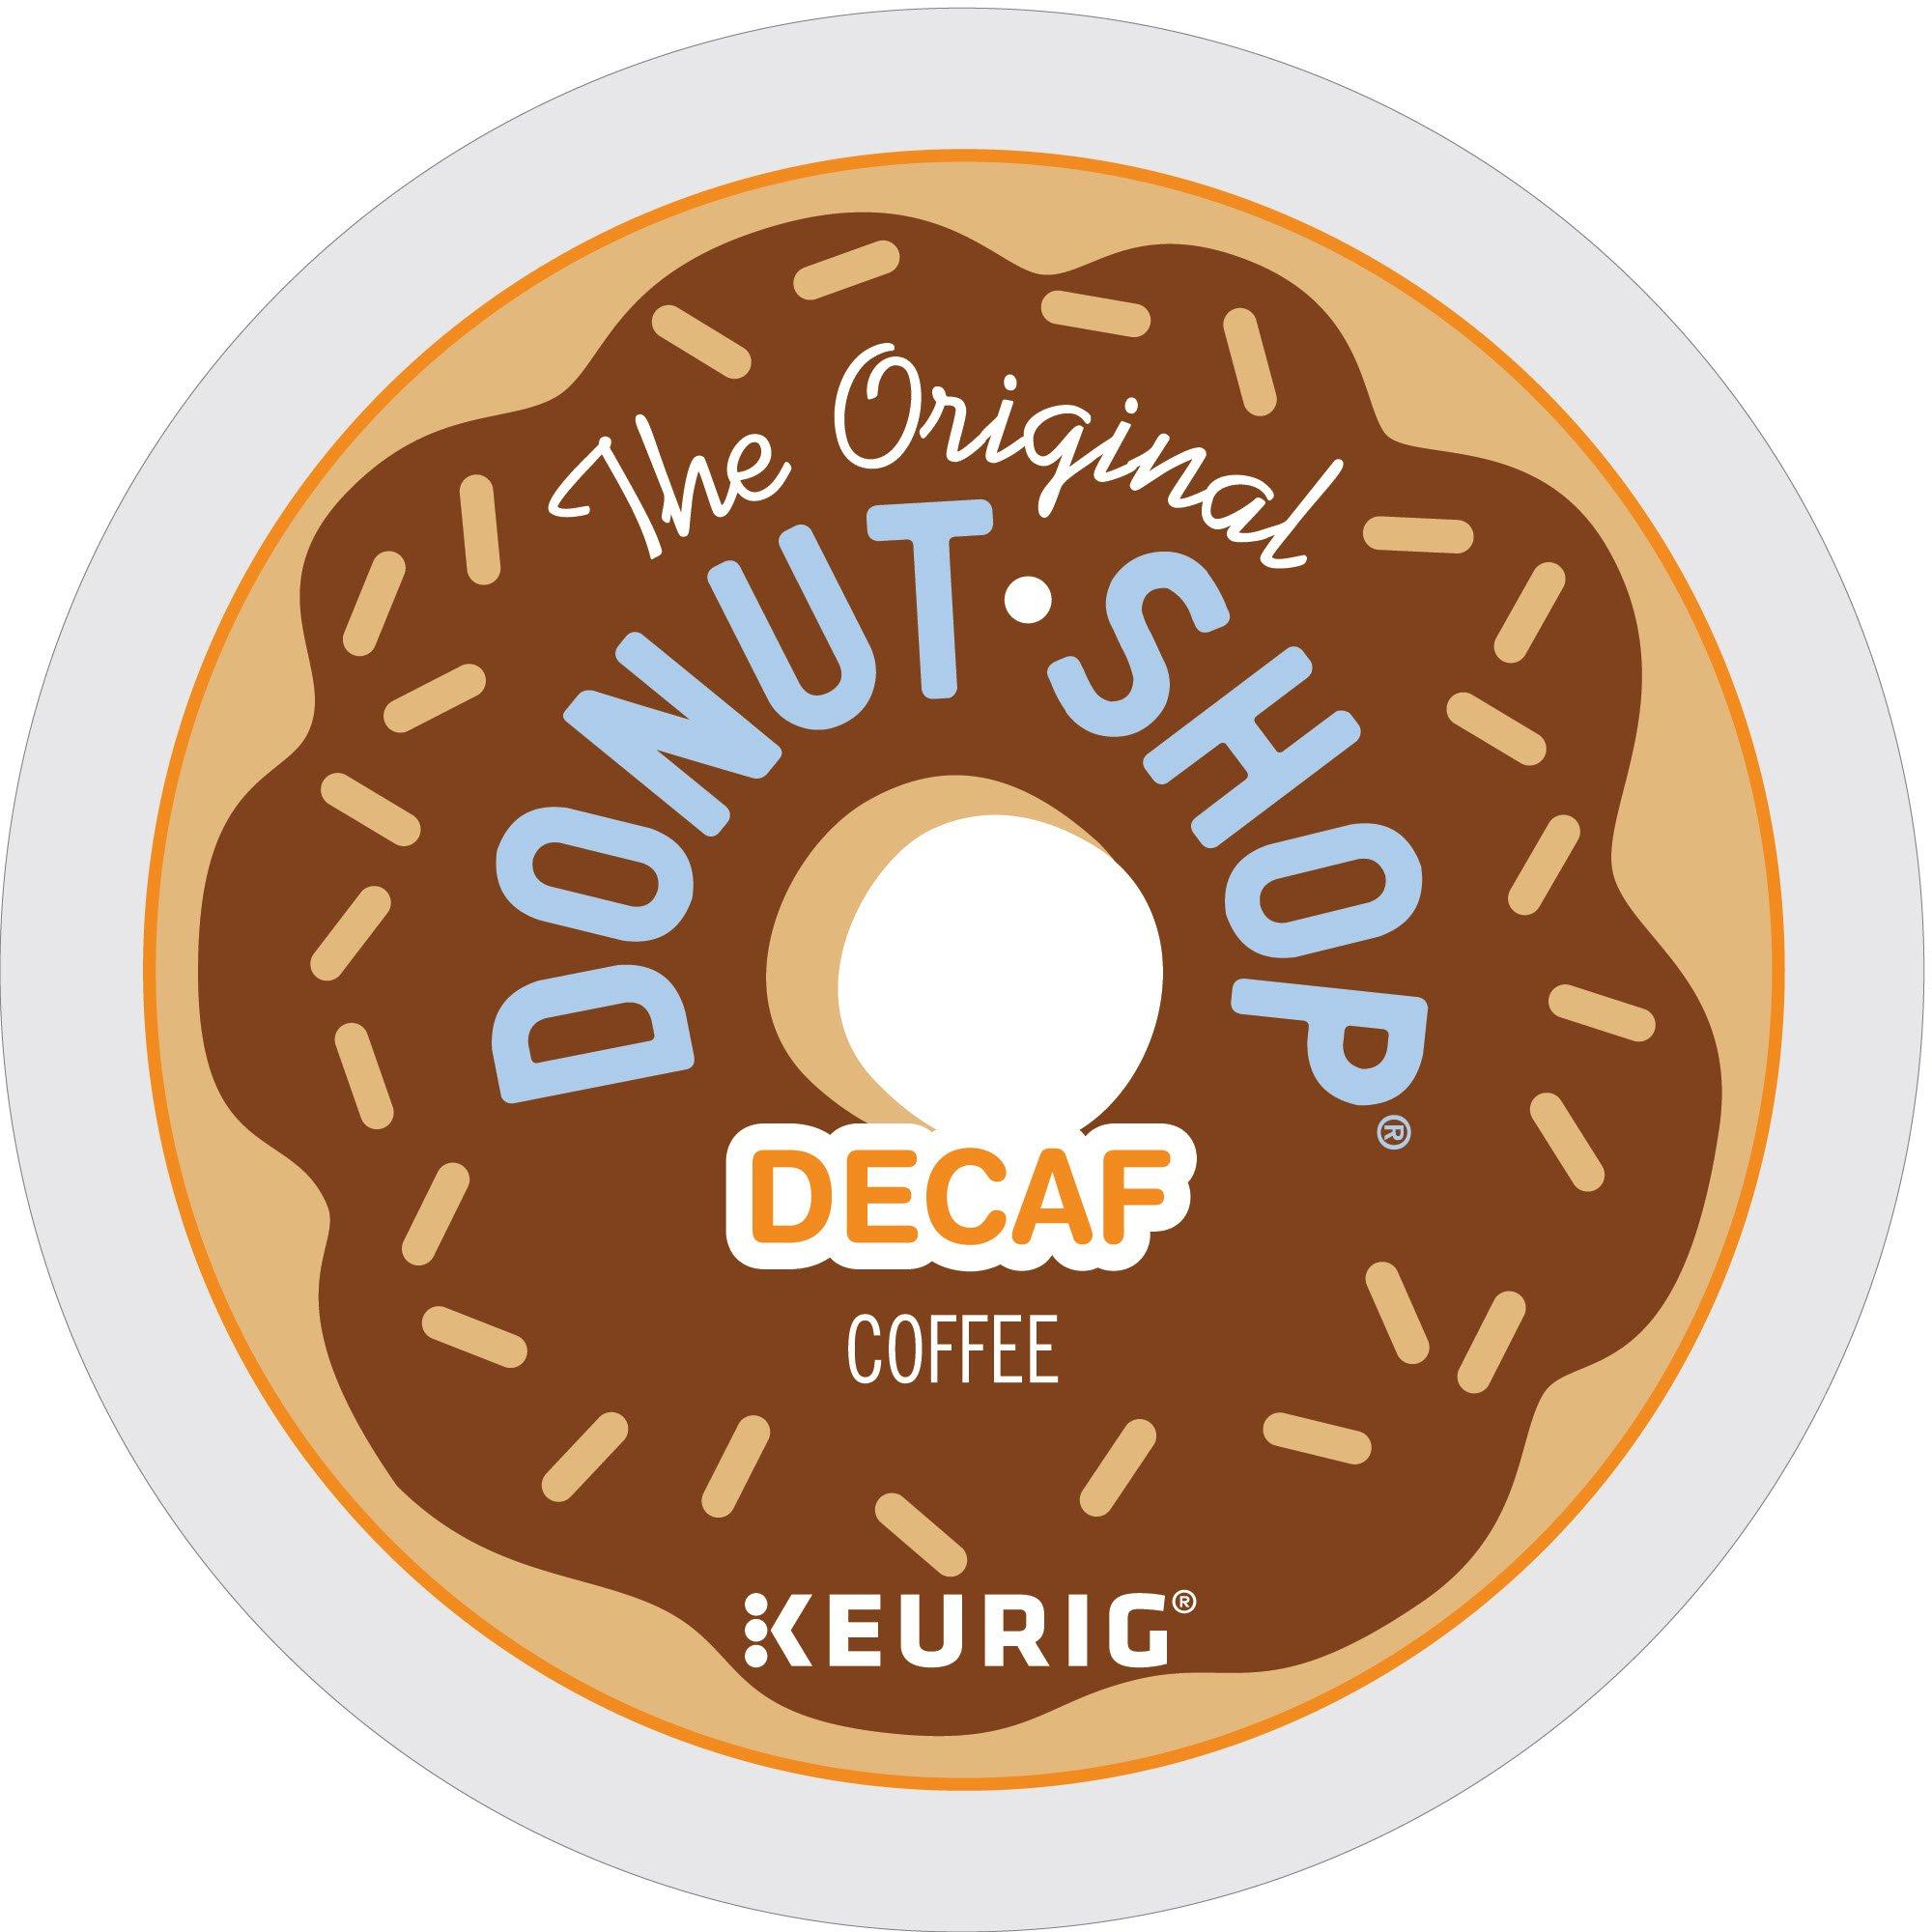 The Original Donut Shop Decaf Keurig Single-Serve K-Cup Pods, Medium Roast Coffee, 72 Count (6 Boxes of 12 Pods)